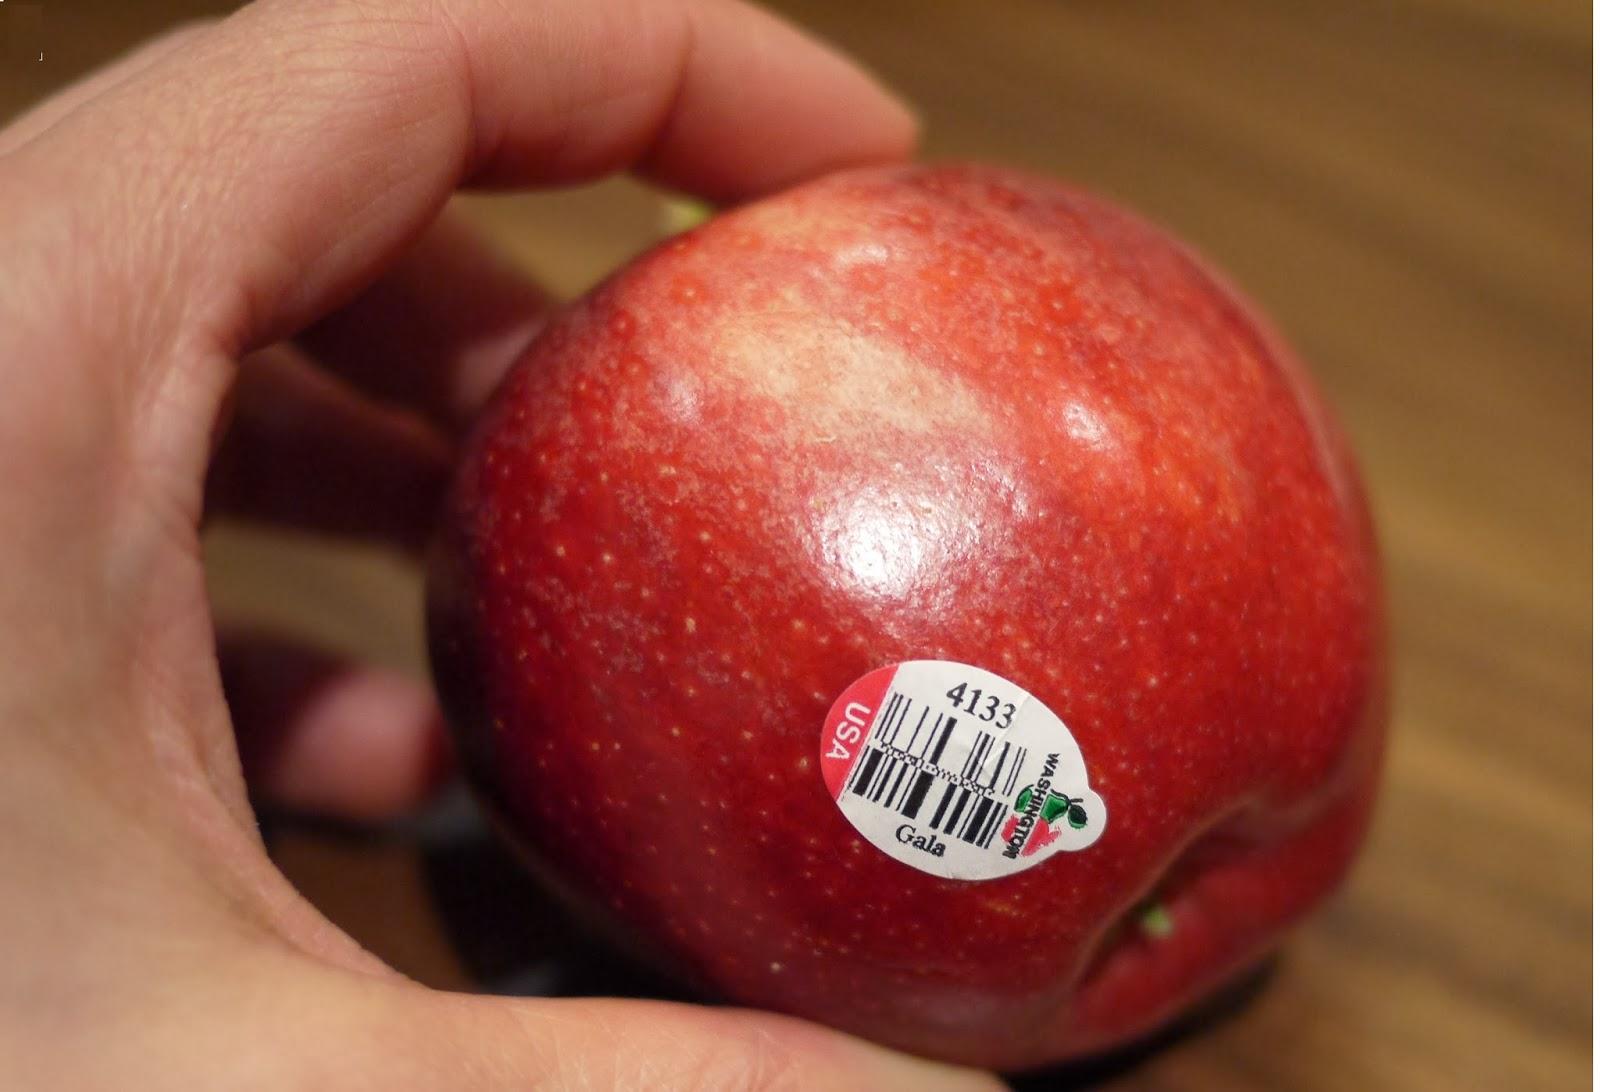 kod sticker pada buah